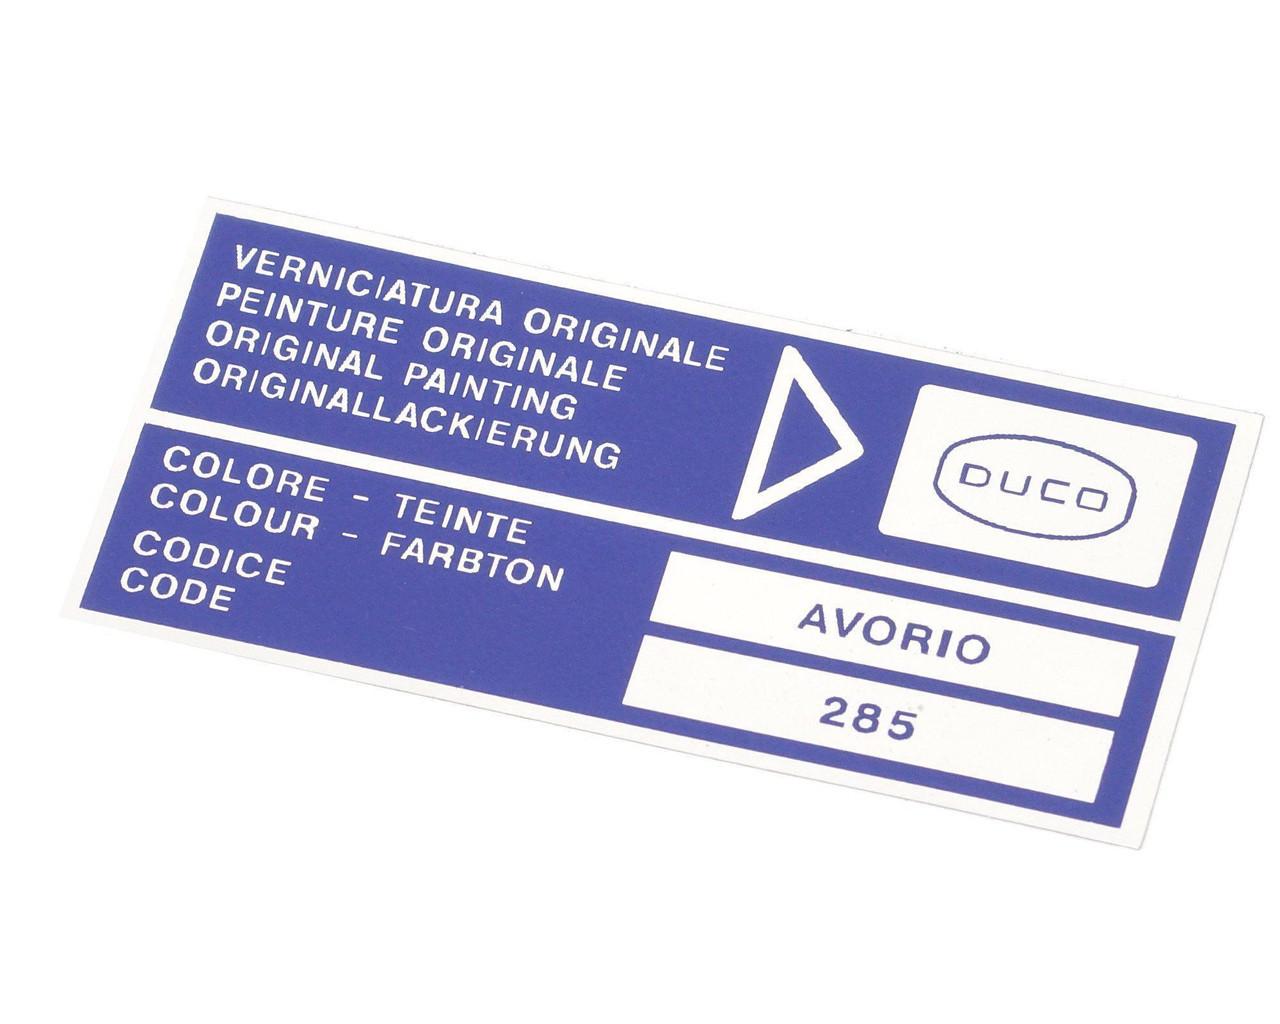 Paint Code Decal - DUCO - Avorio (Ivory)